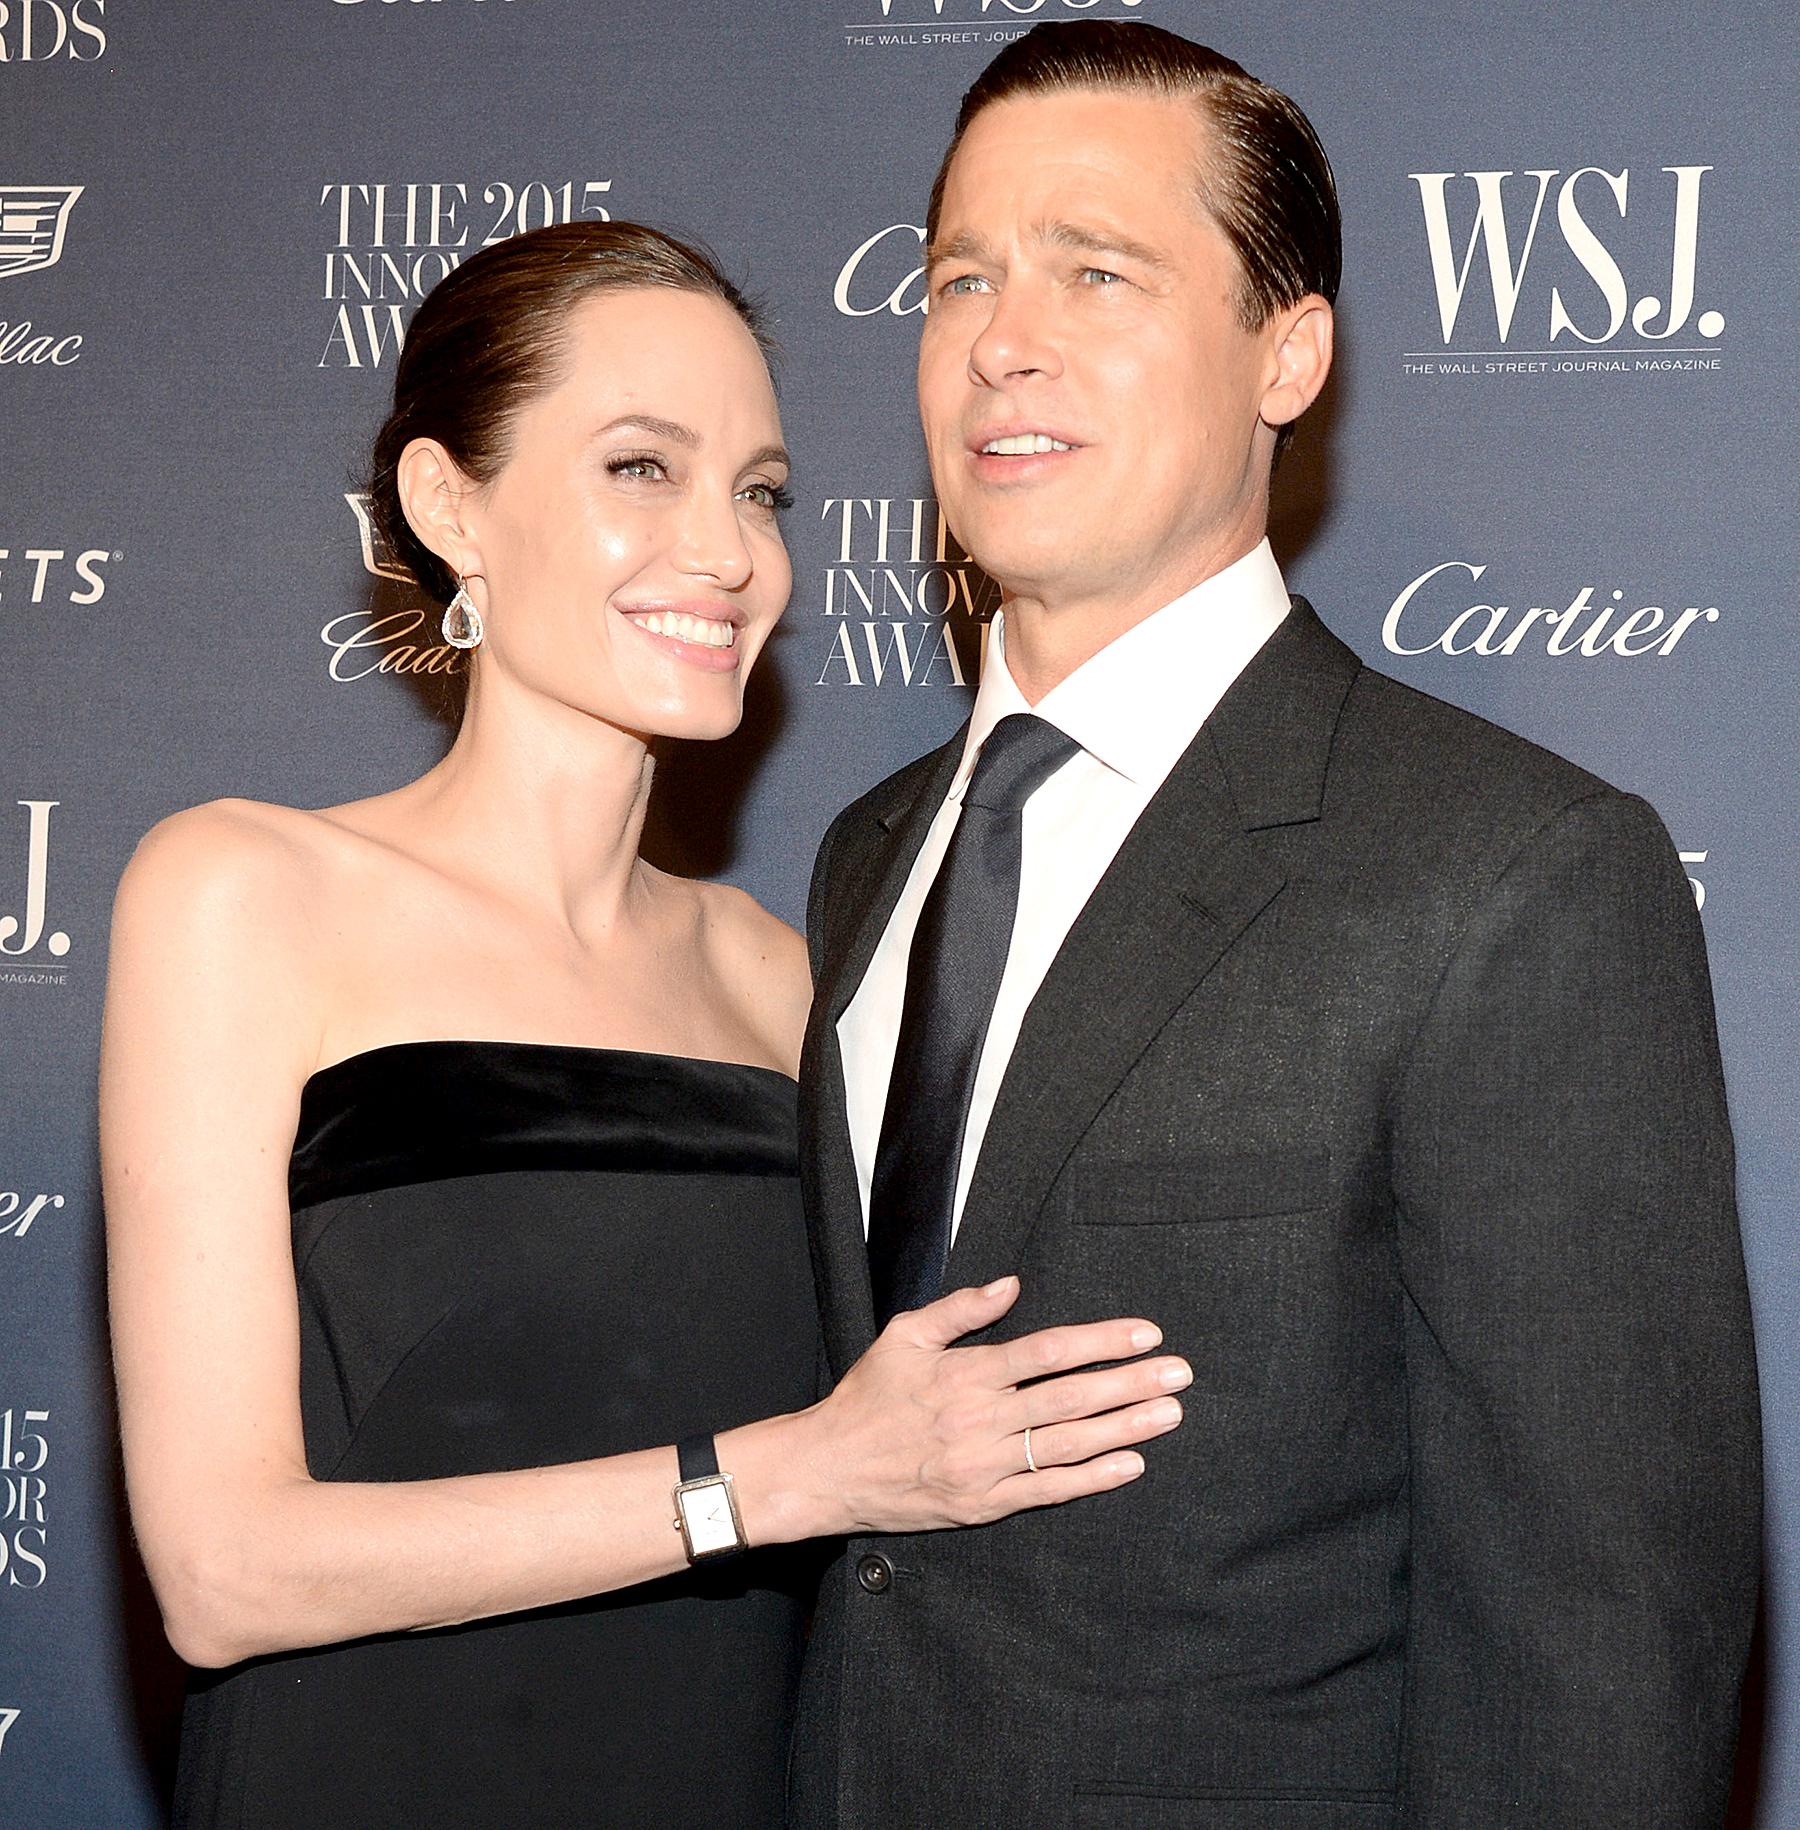 Angelina Jolie and Brad Pitt attend the WSJ. Magazine 2015 Innovator Awards at the Museum of Modern Art on November 4, 2015 in New York City.